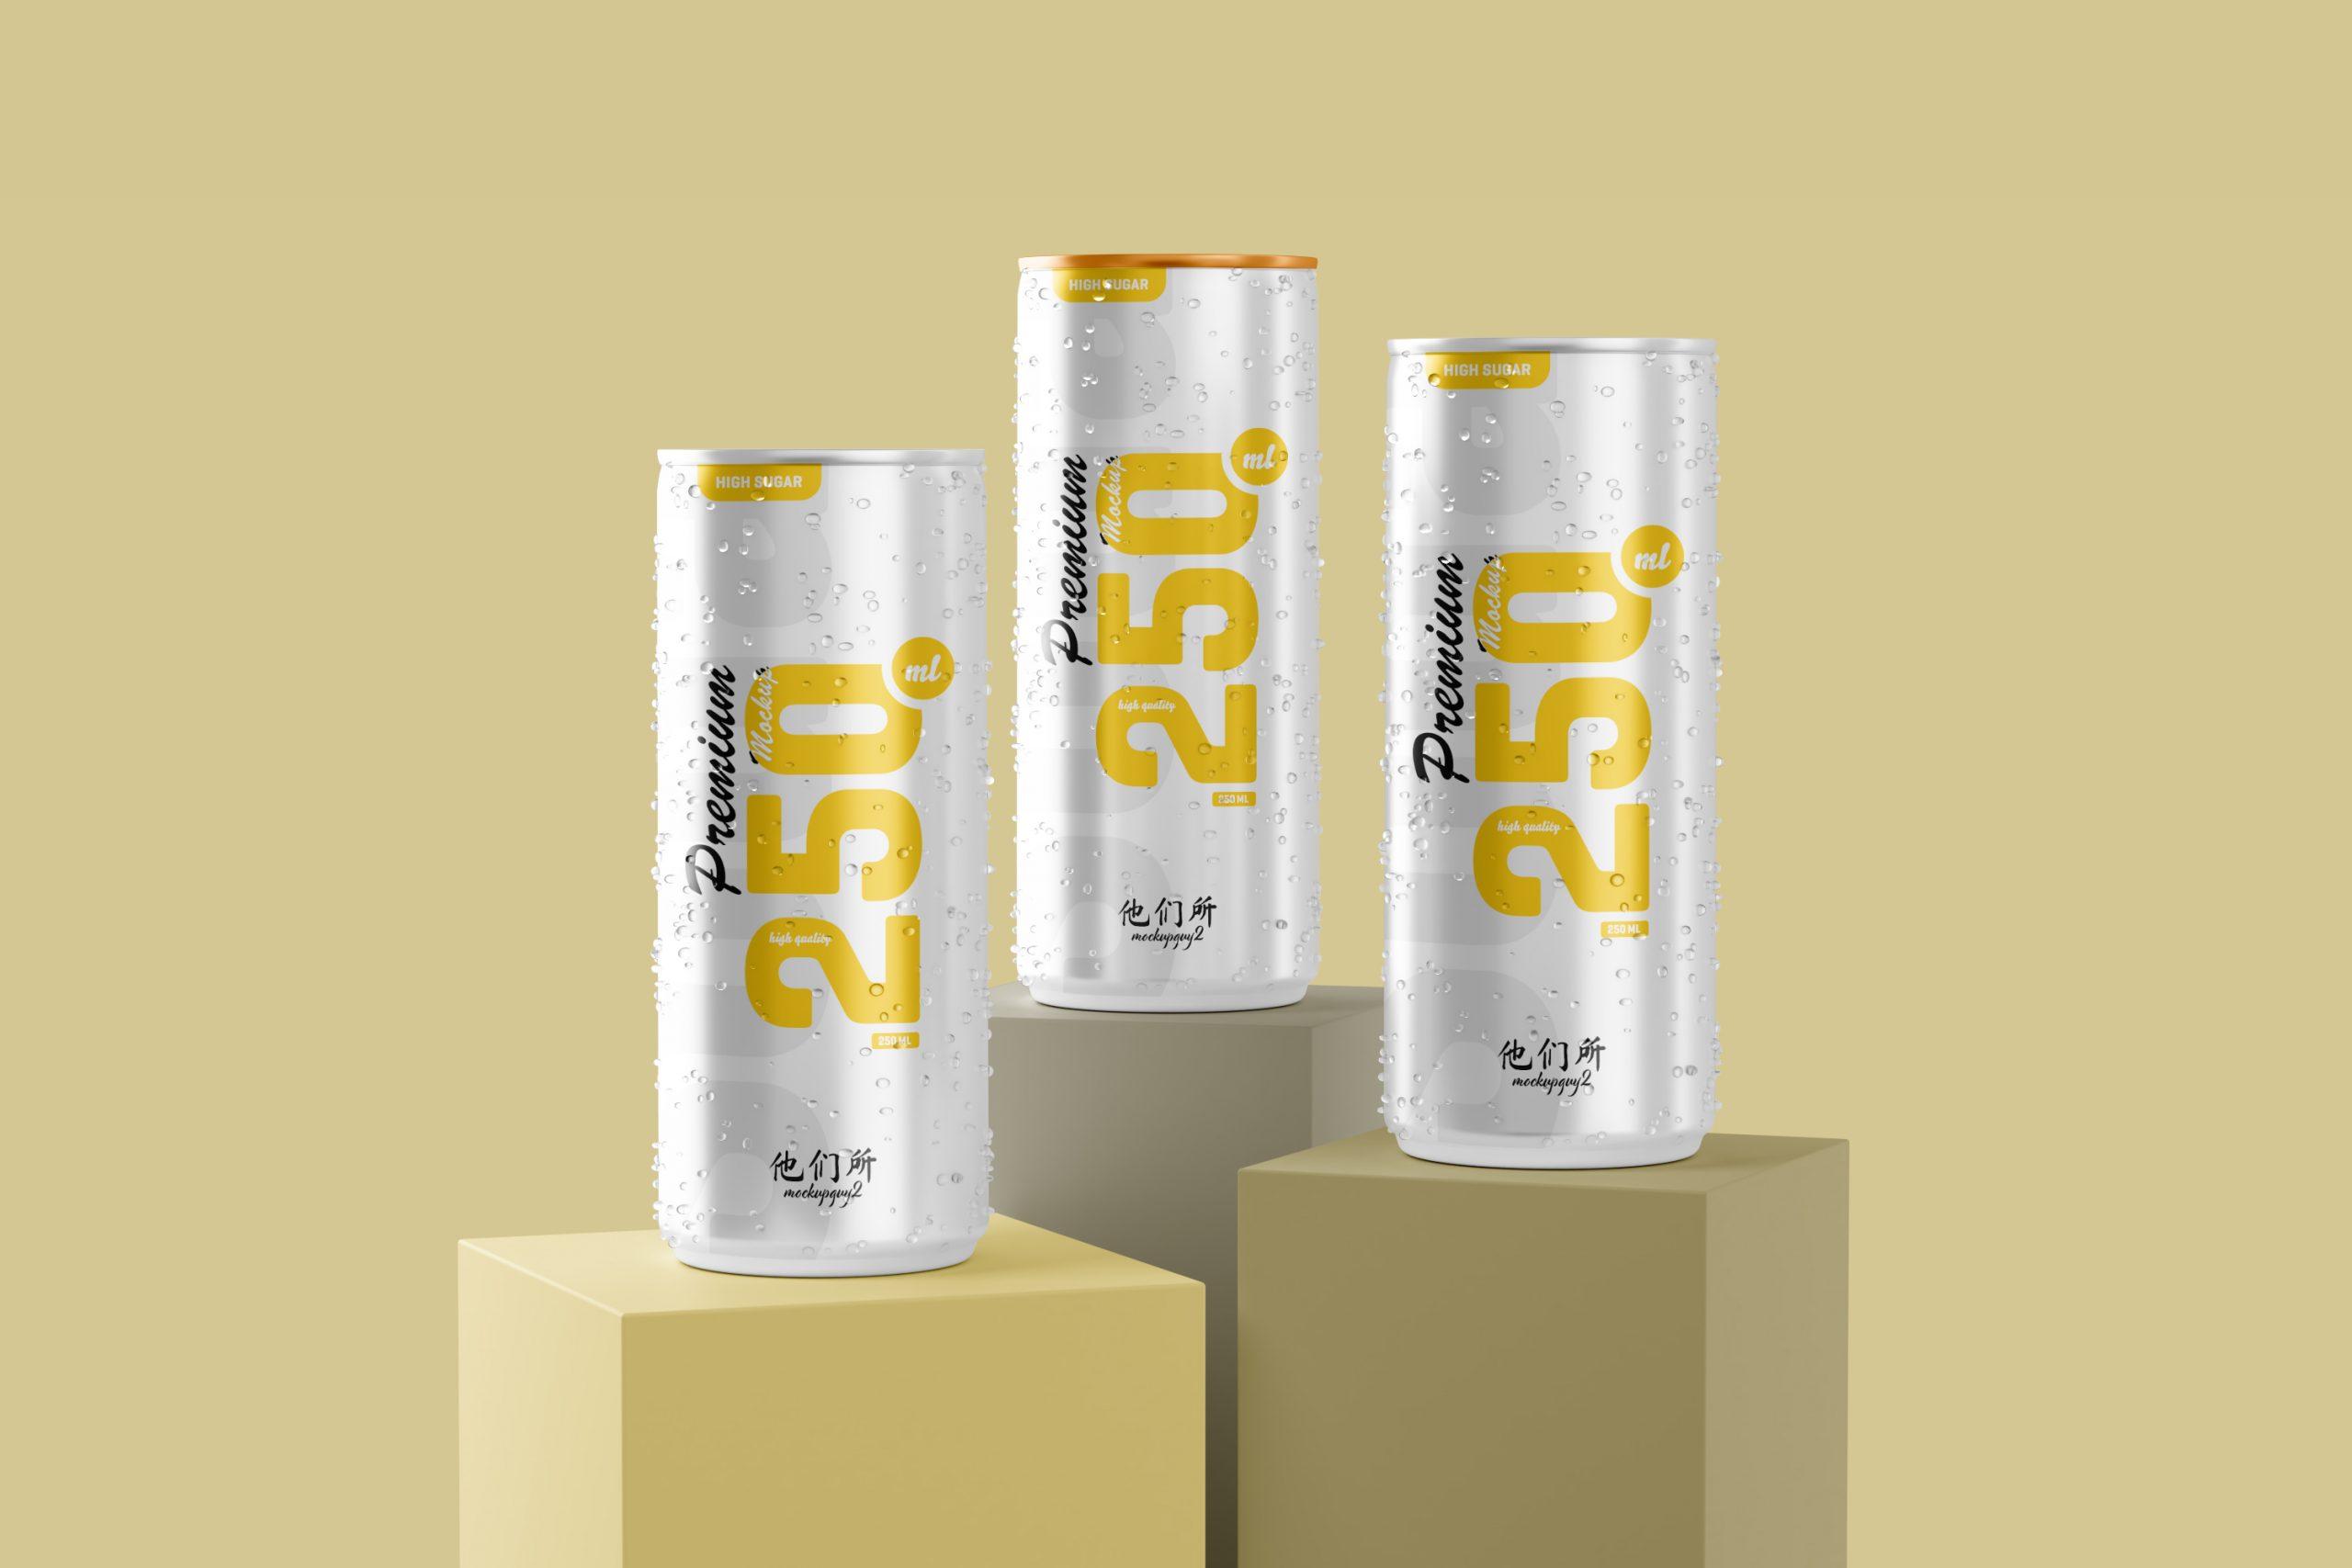 250ml Soda Can Mockup